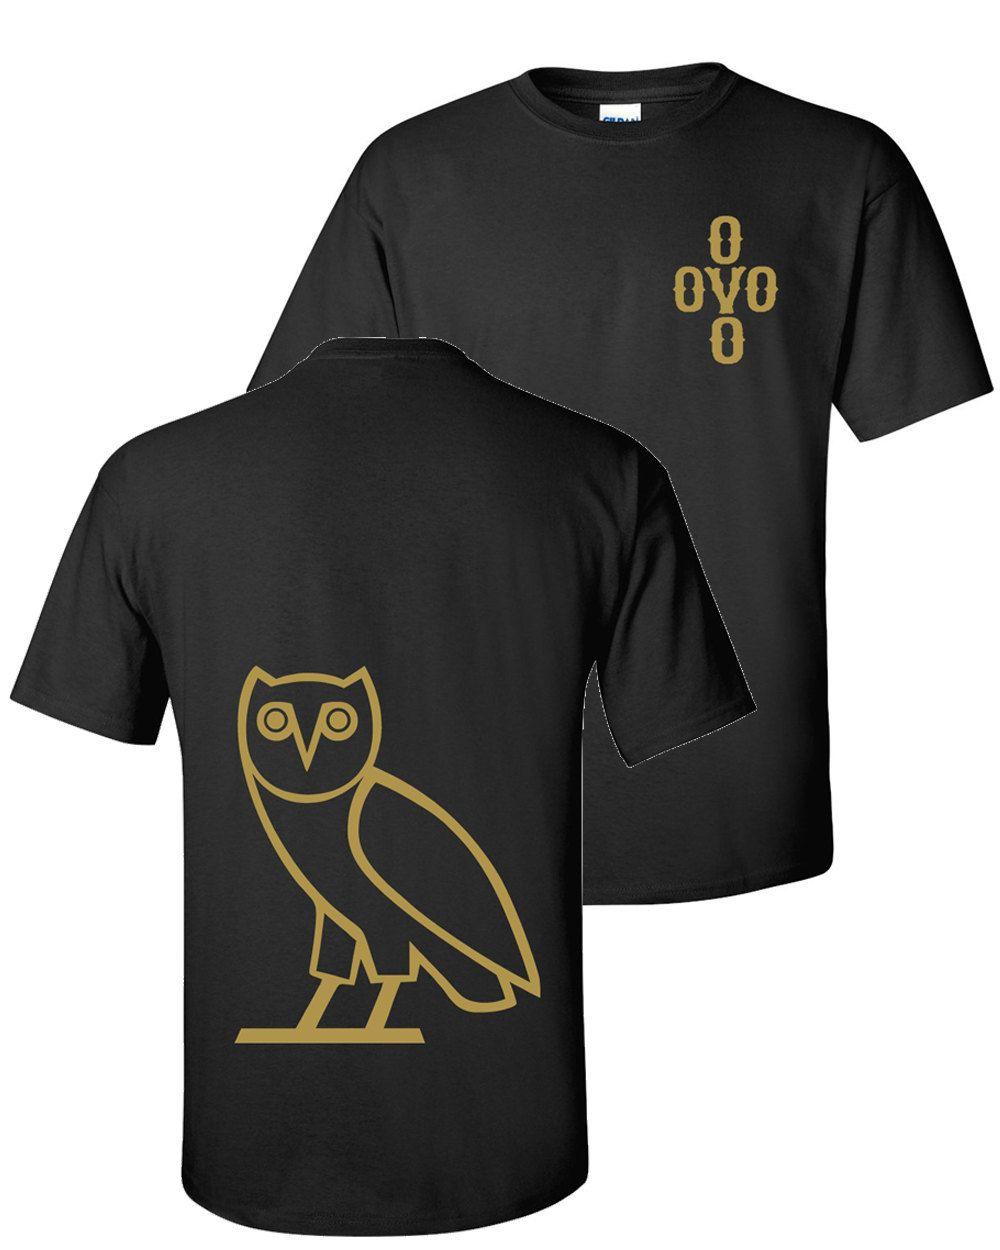 c414b9a98b6 OVO Classic Owl Tee Black T-Shirt - Metallic Gold Ink by MambaStudio on Etsy